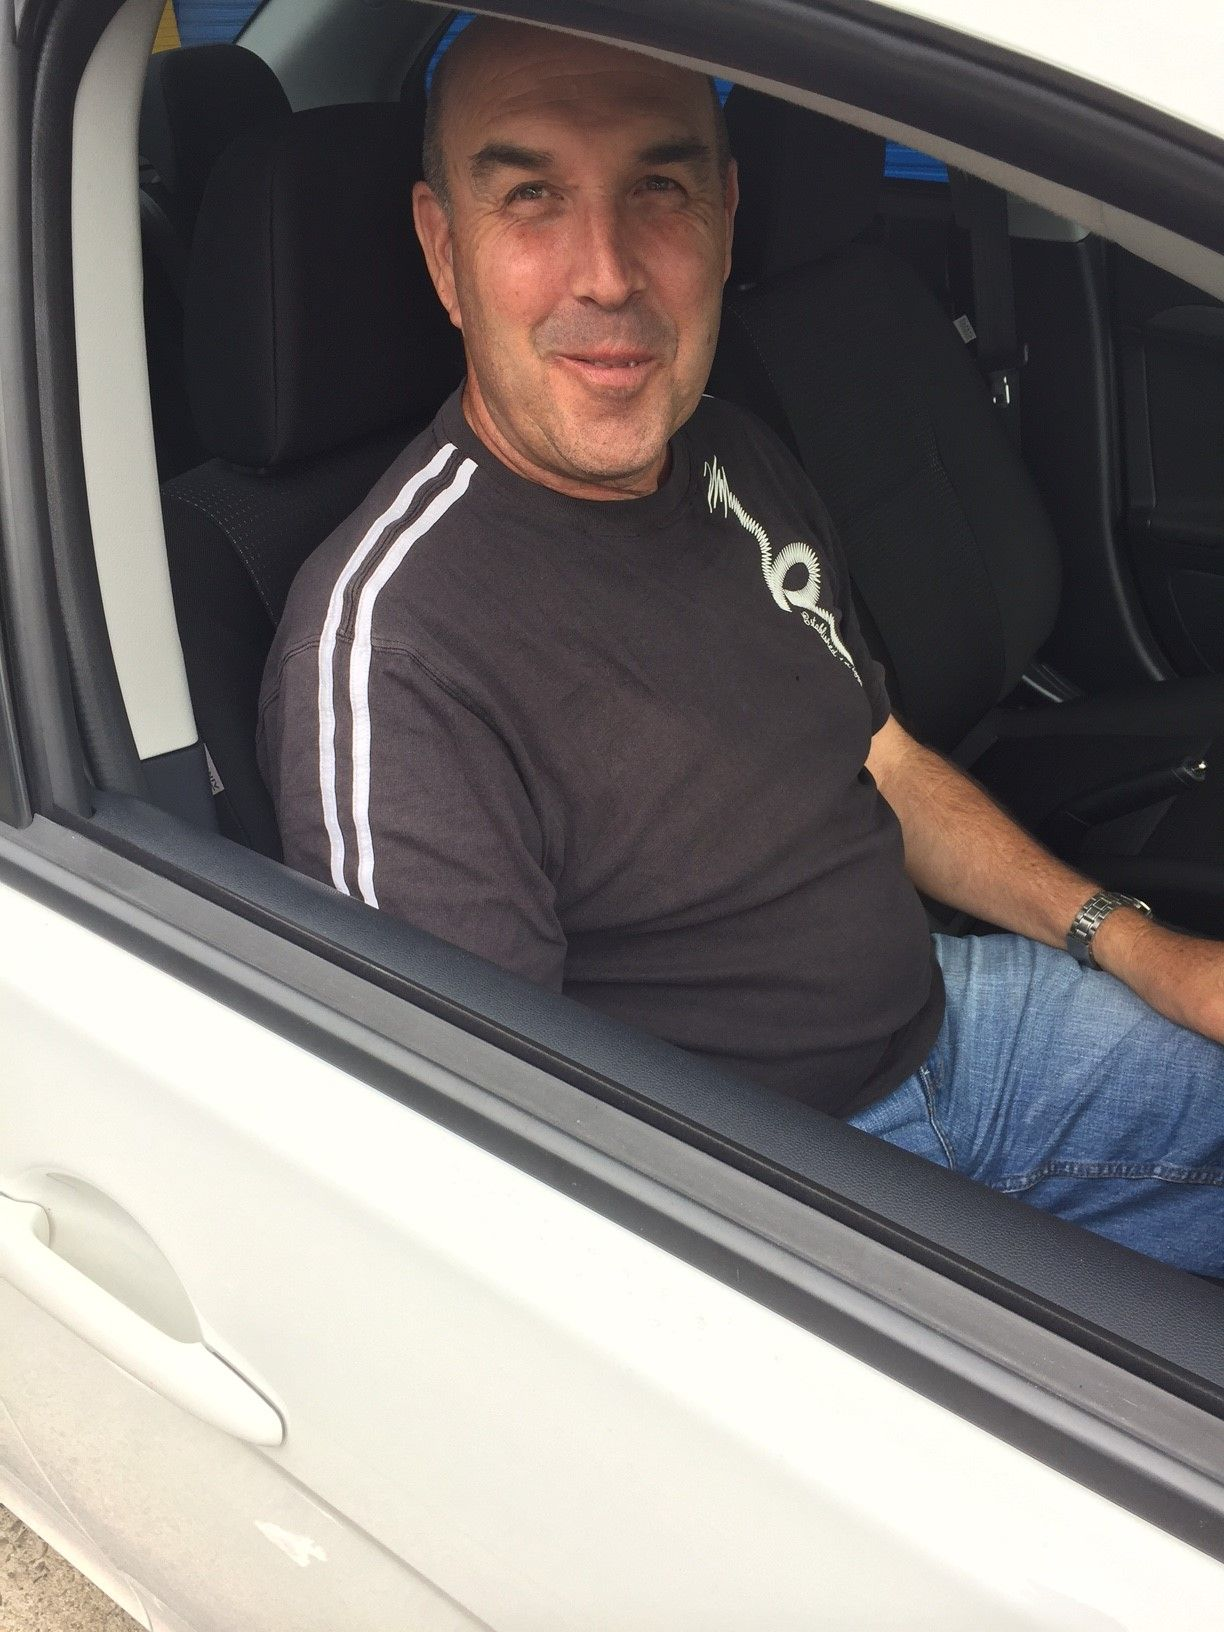 dave edwards mitsubishi lancer car business customers